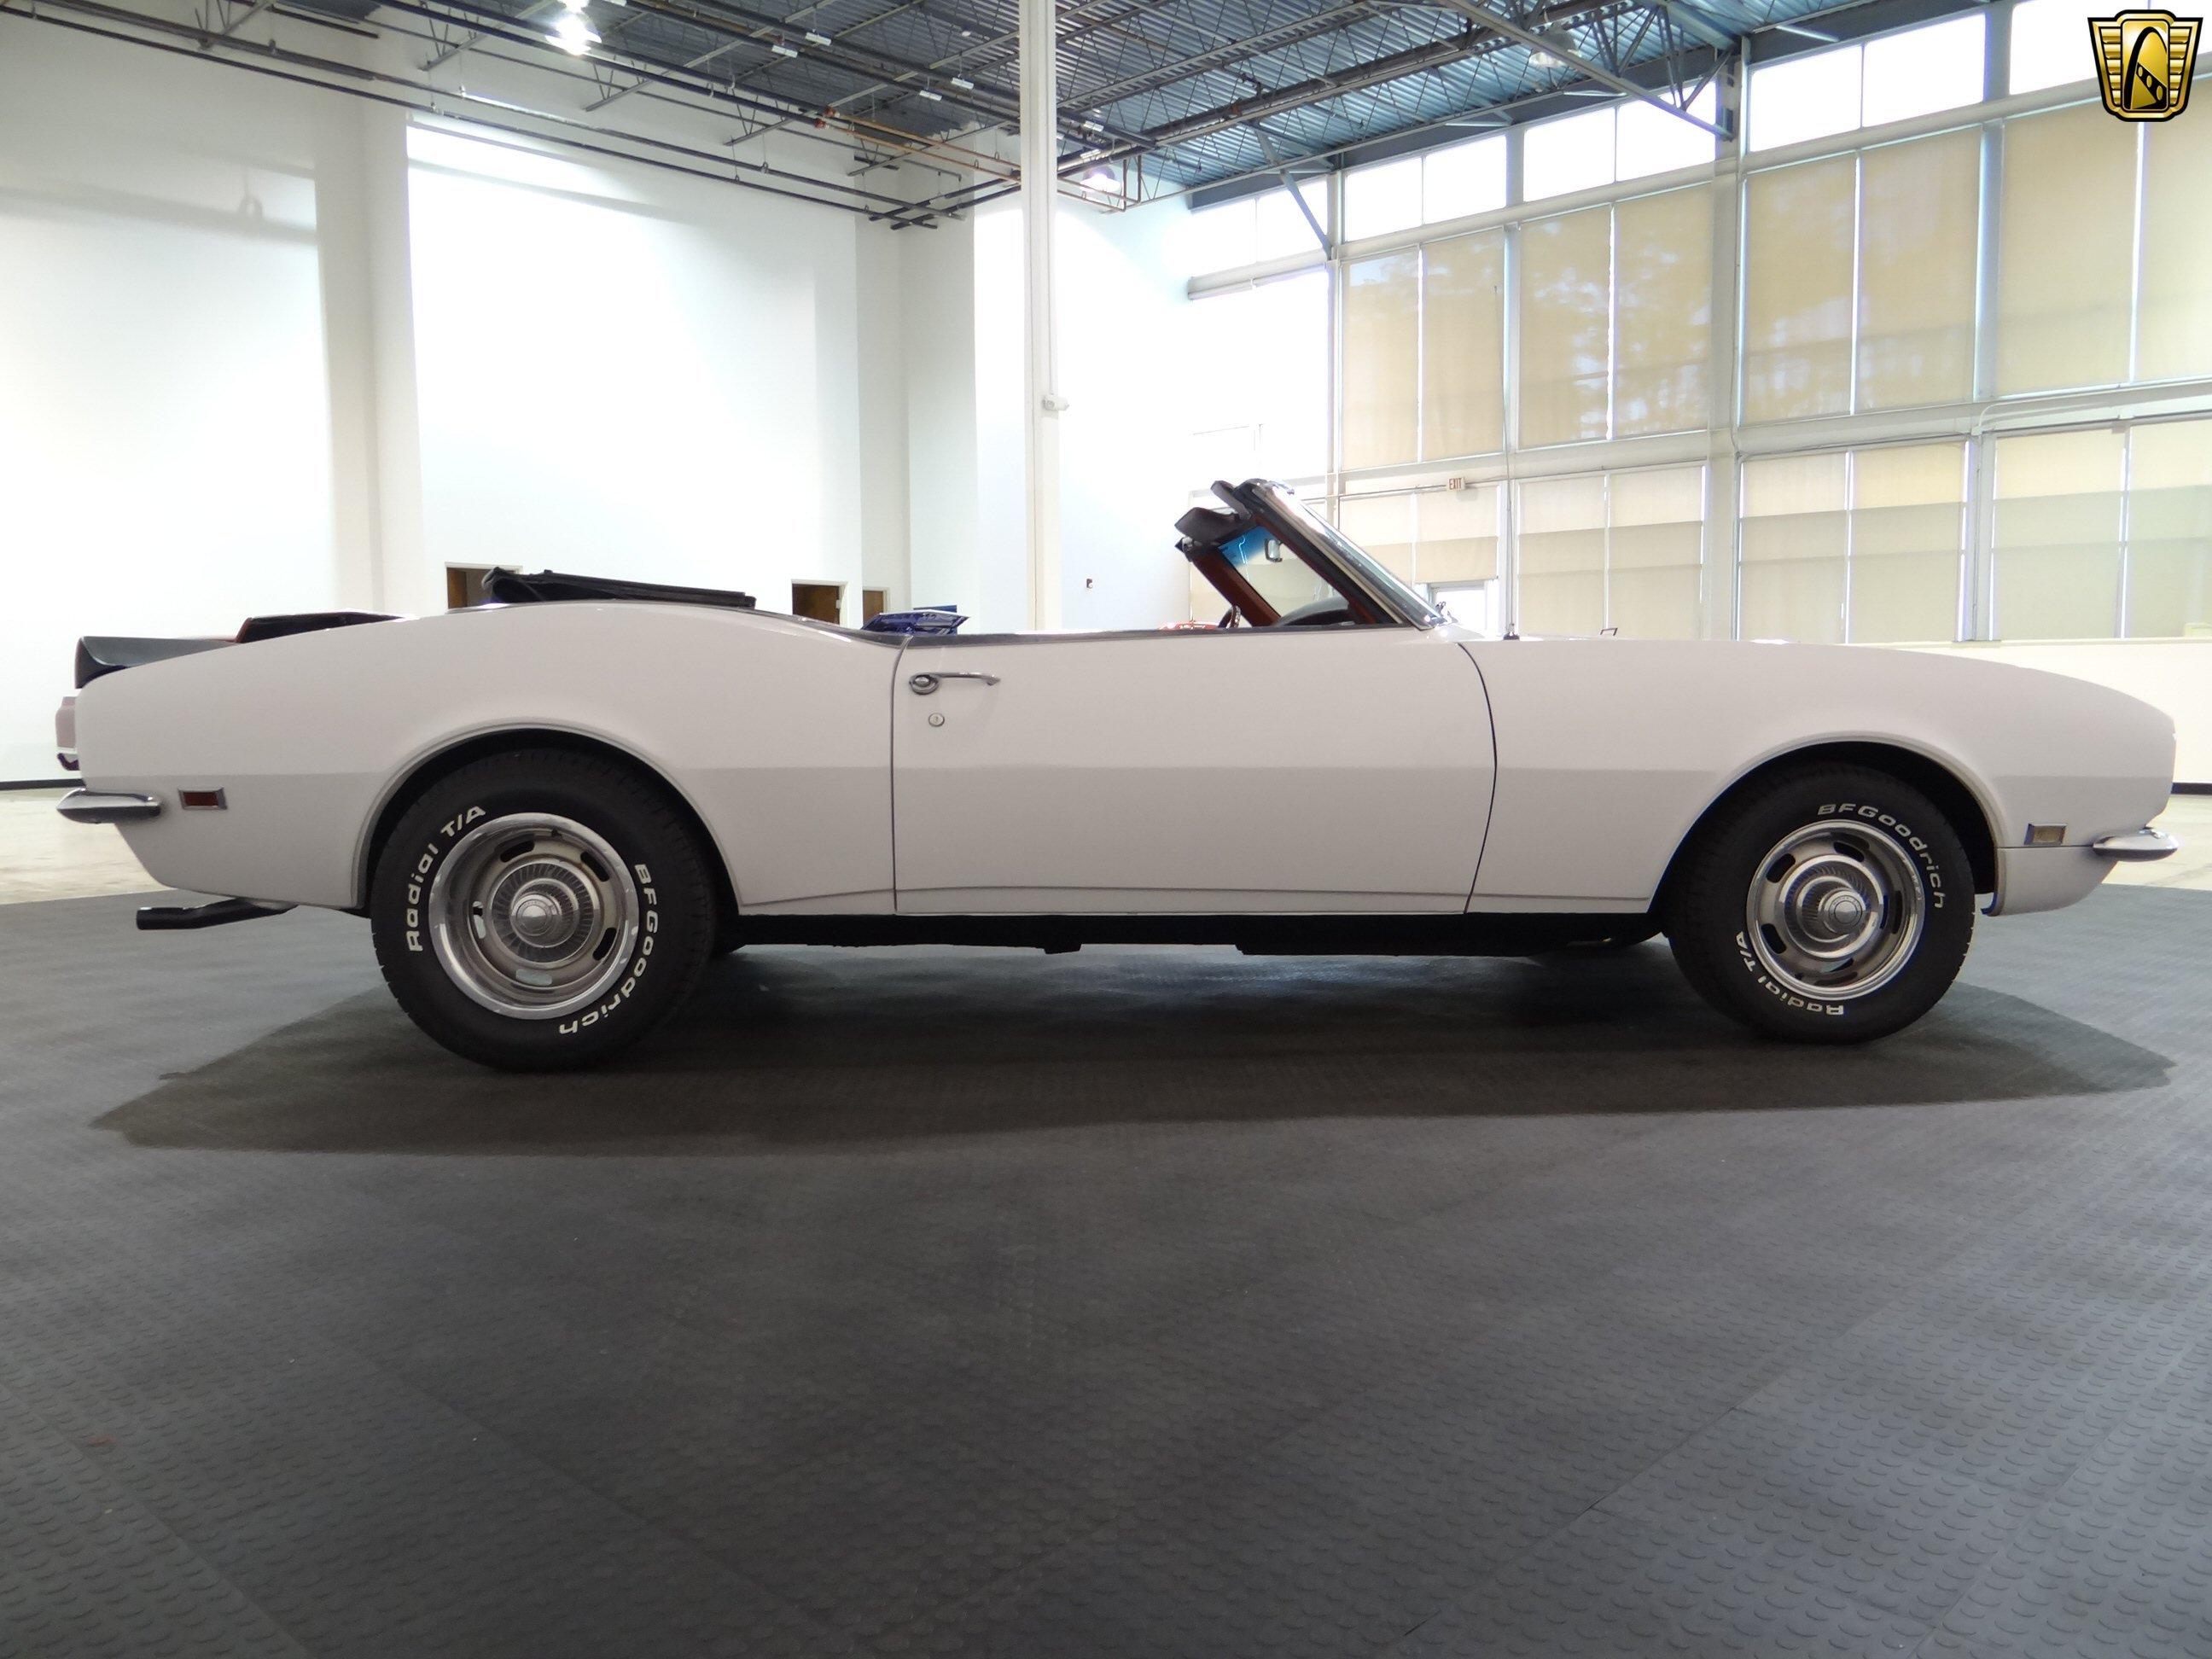 1968 Chevrolet Camaro Chevy Cars White Convertible Classic Wallpaper 2592x1944 802352 Wallpaperup